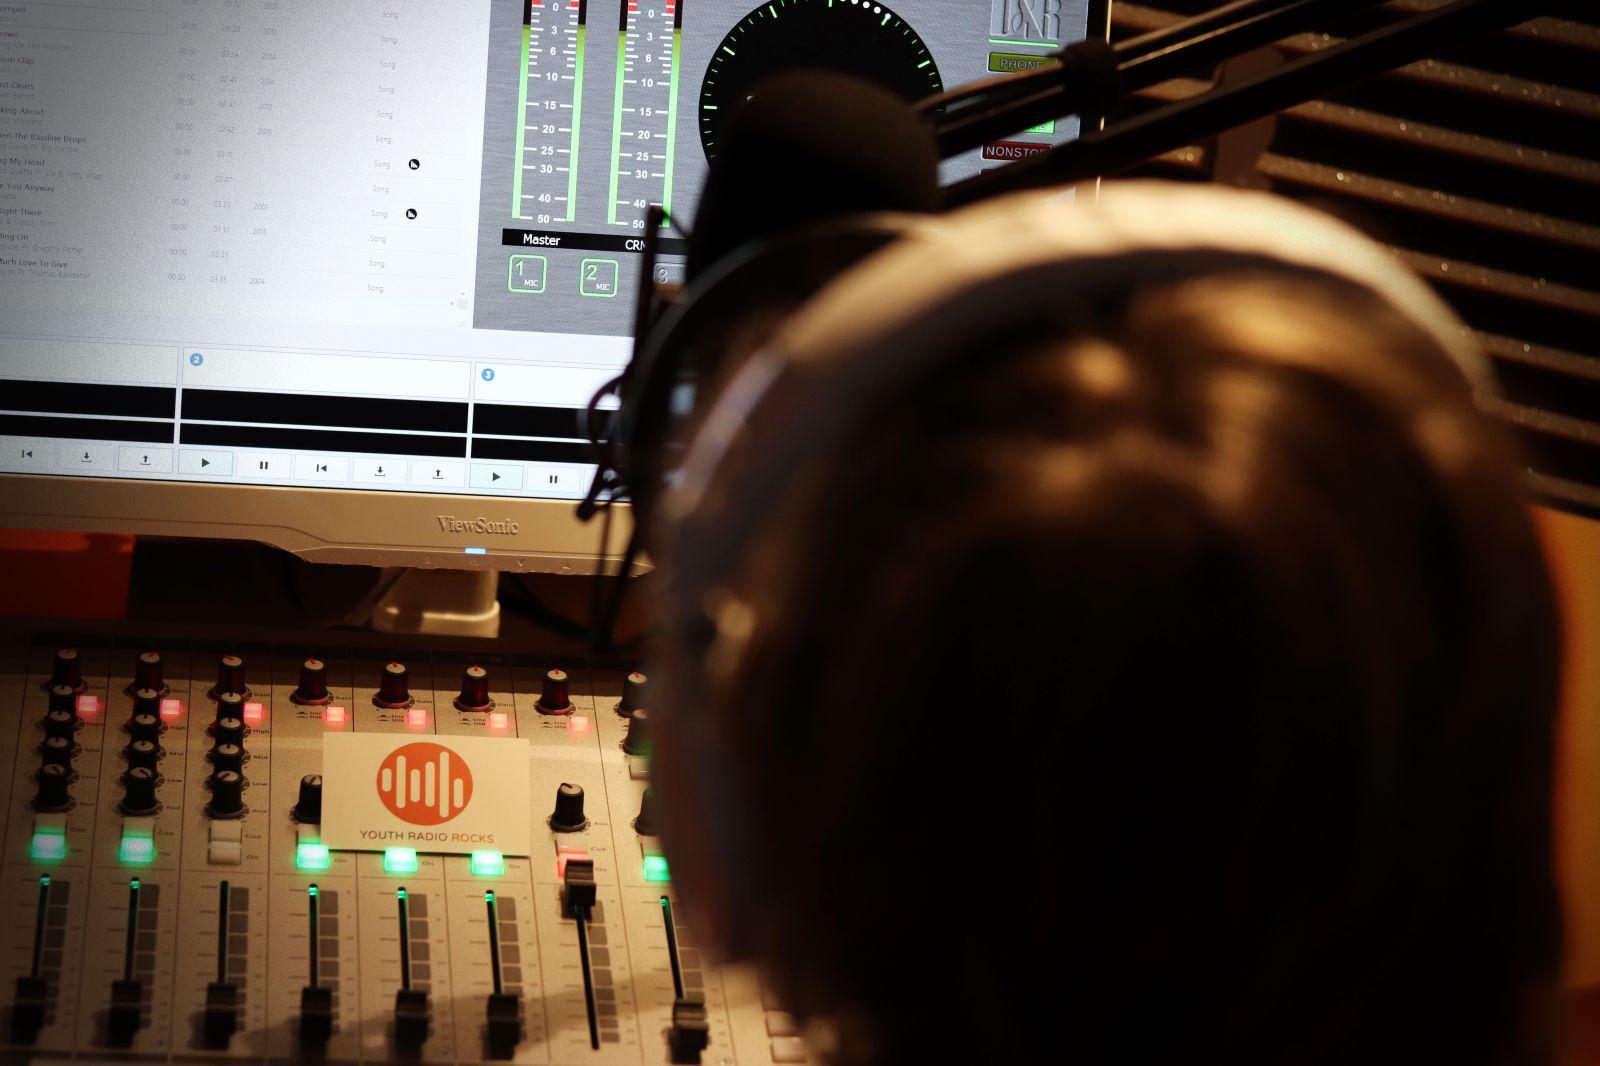 Youth Radio Rocks - Radio Experiences on the Isle of Wight